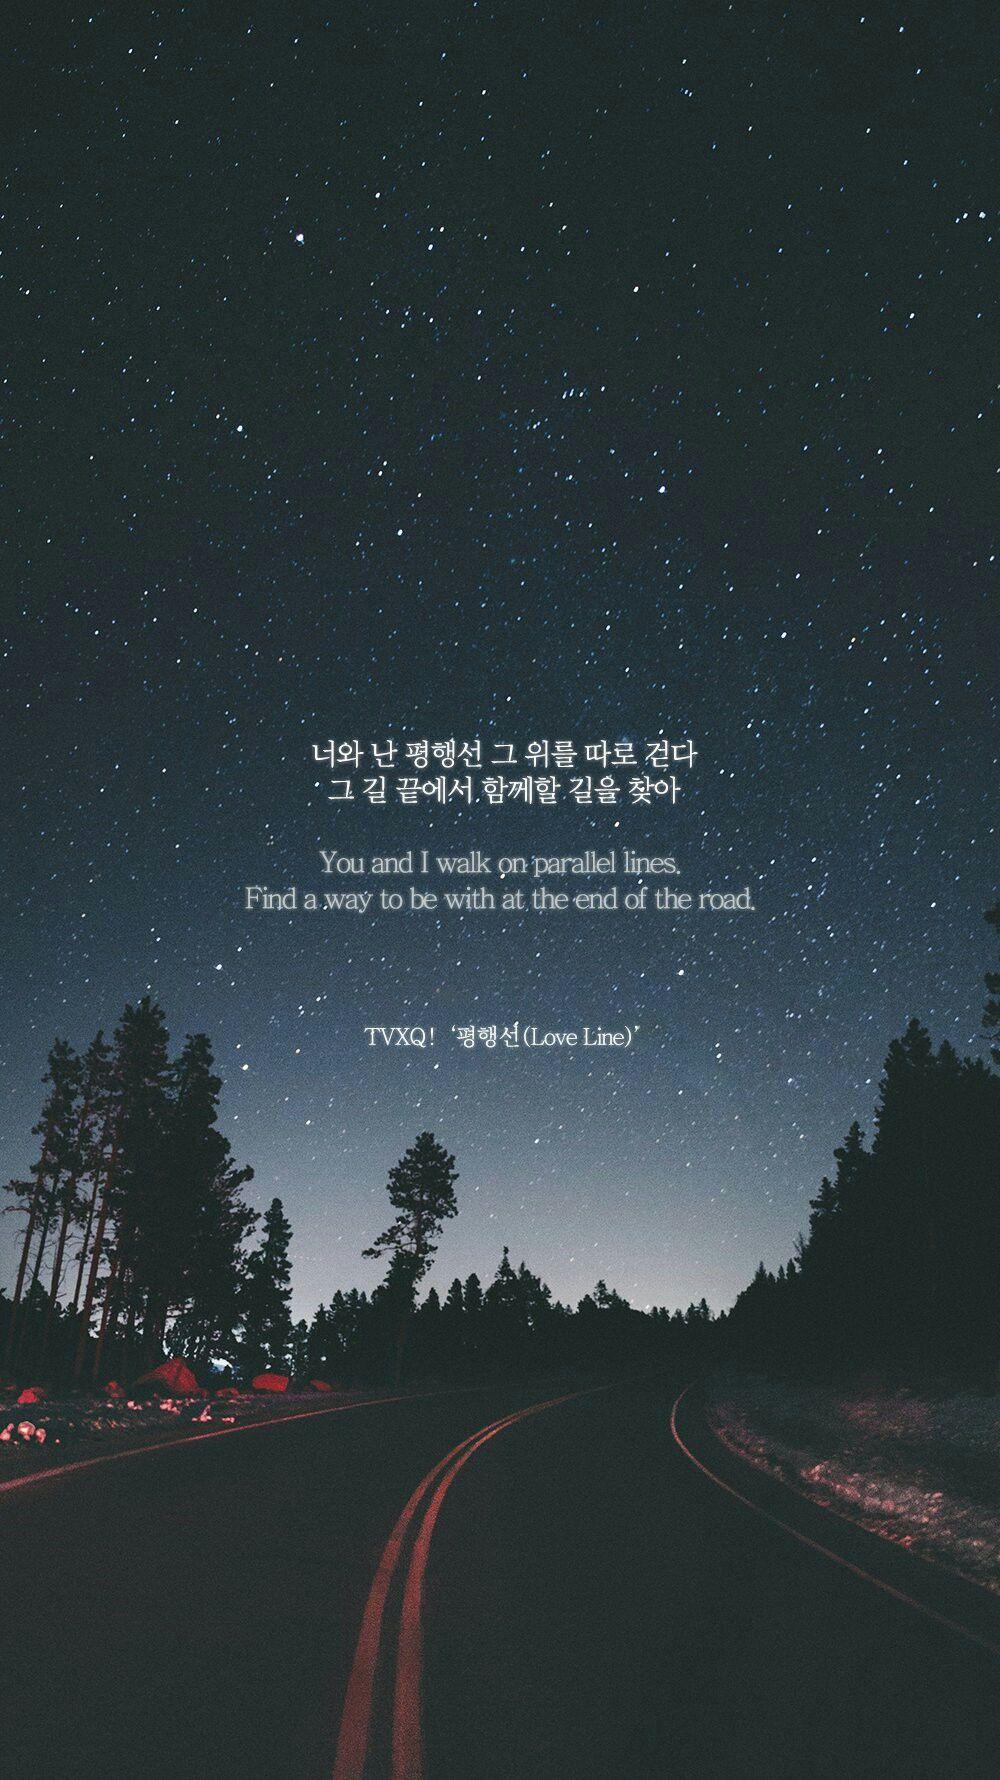 Tvxq Love Line Kpop Lyrics Pinterest Quotes Korean Quotes